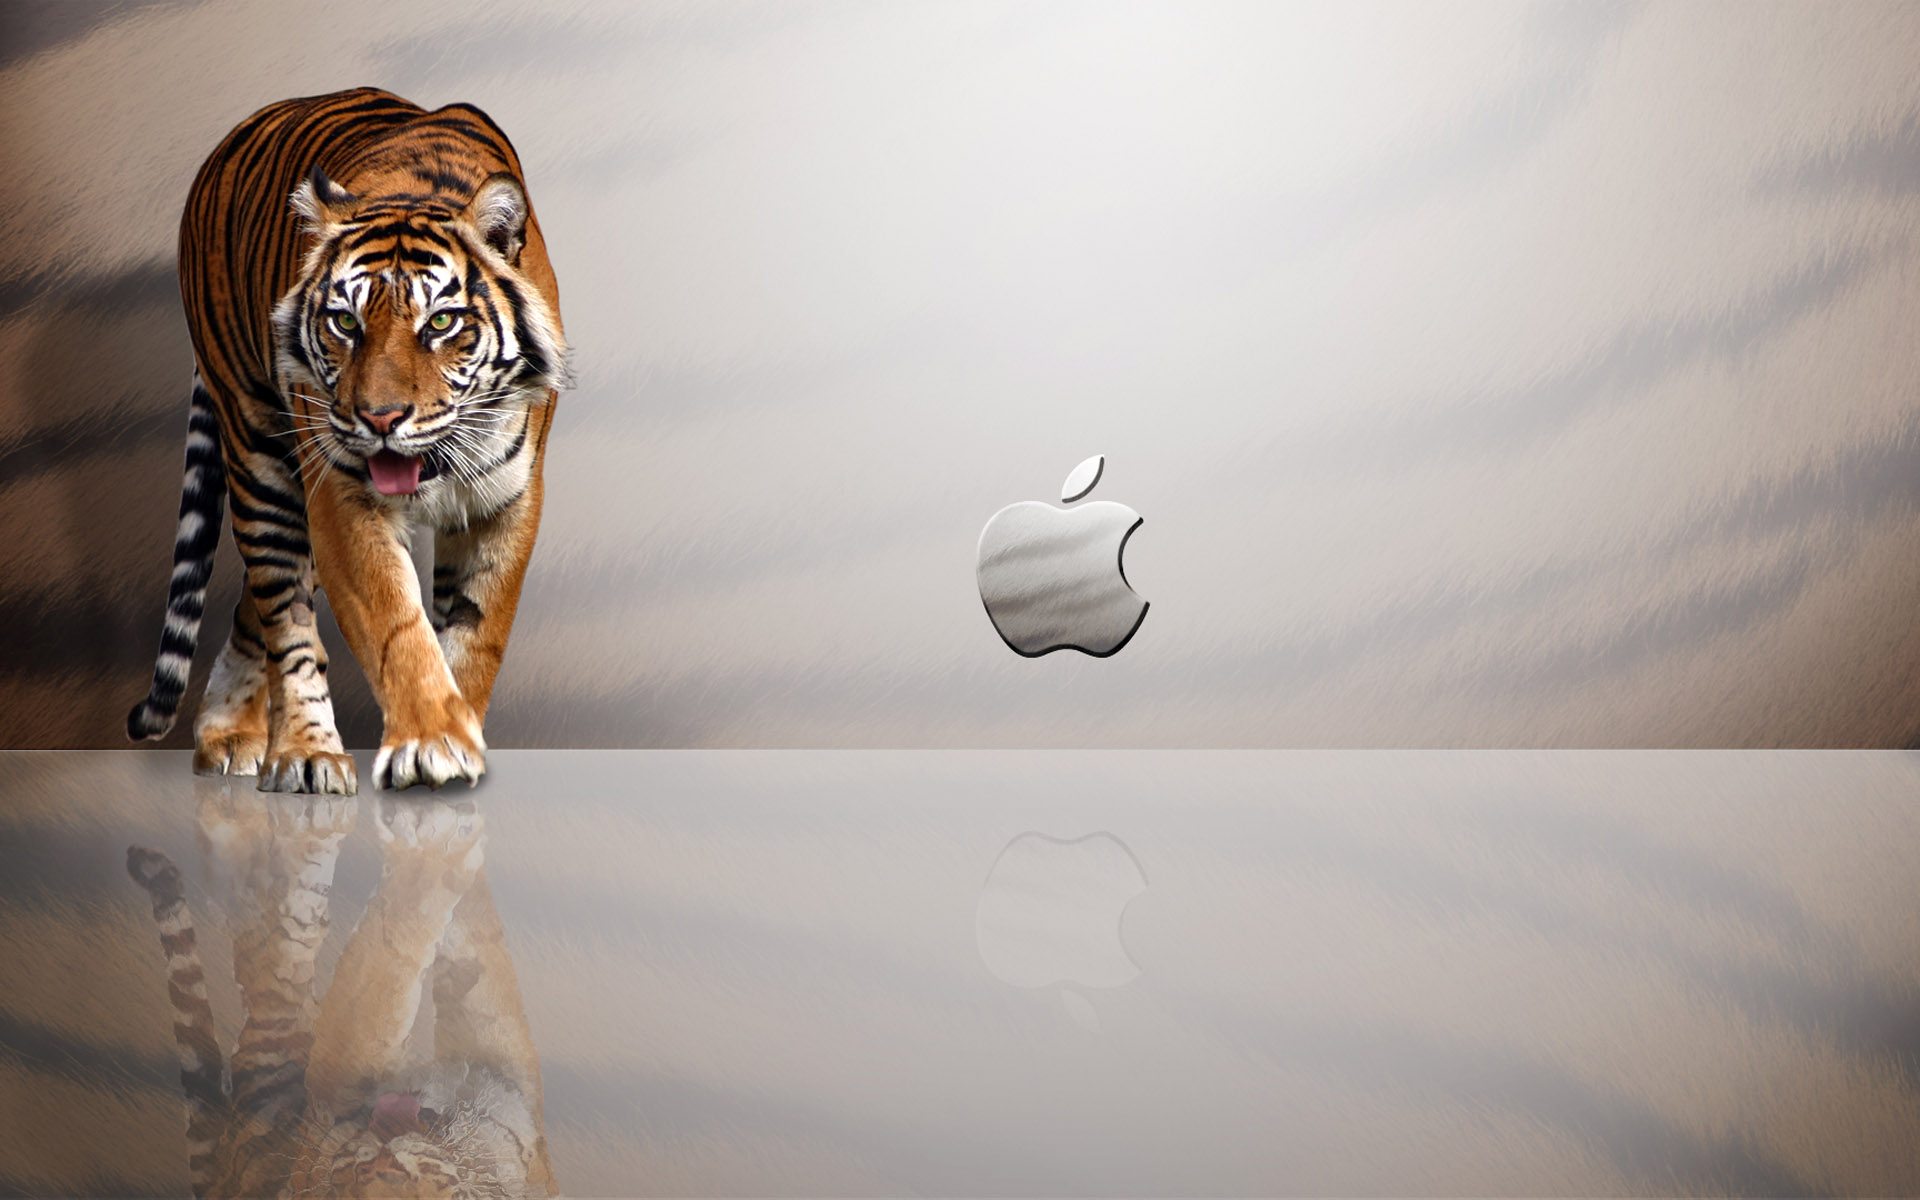 Apple MAC Tiger Wallpapers HD Wallpapers 1920x1200